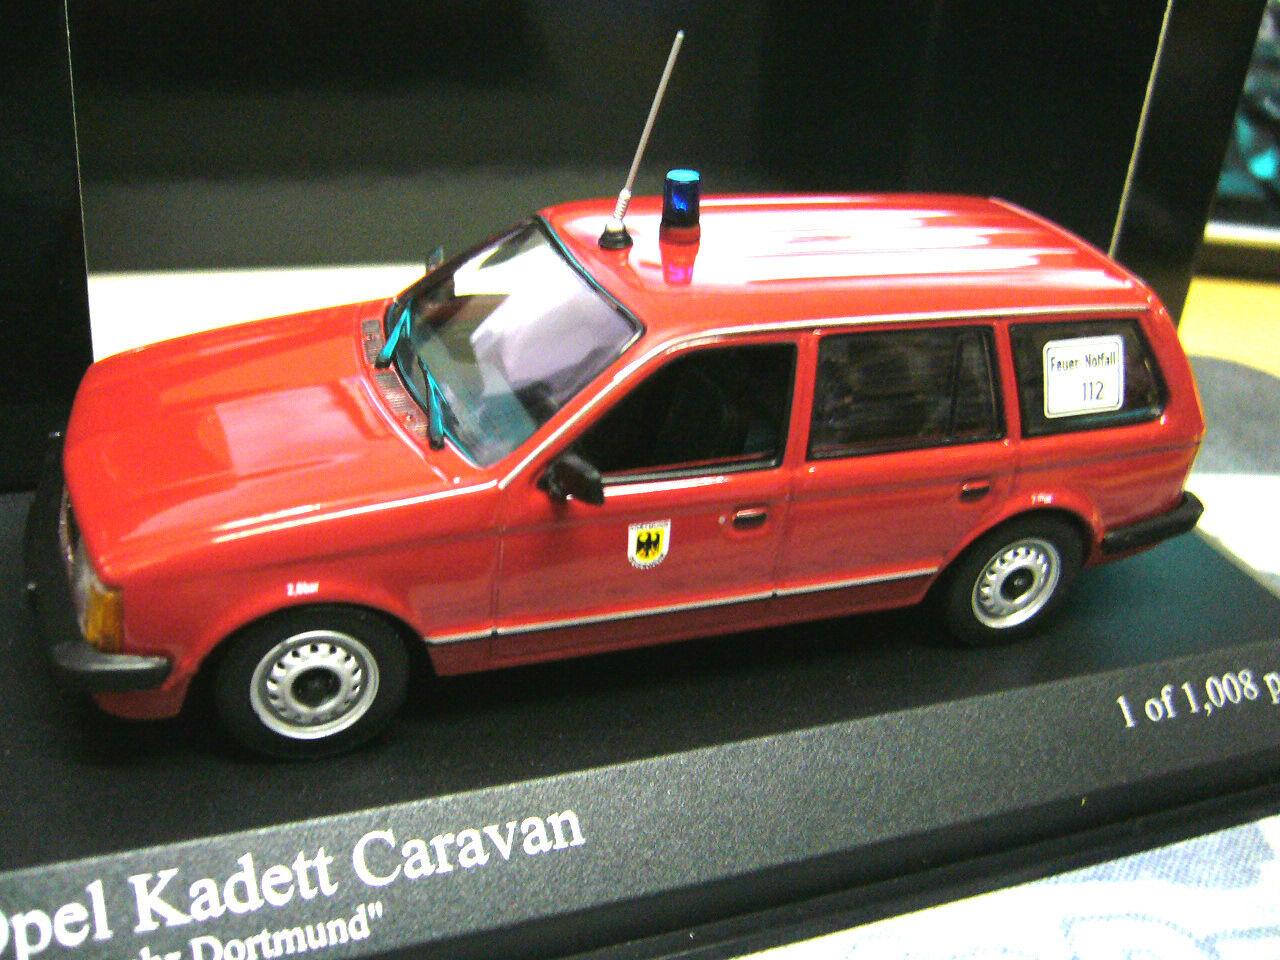 OPEL Kadett D Kombi Caravan pompiers 1979 Dortmund Minichamps pma 1 43